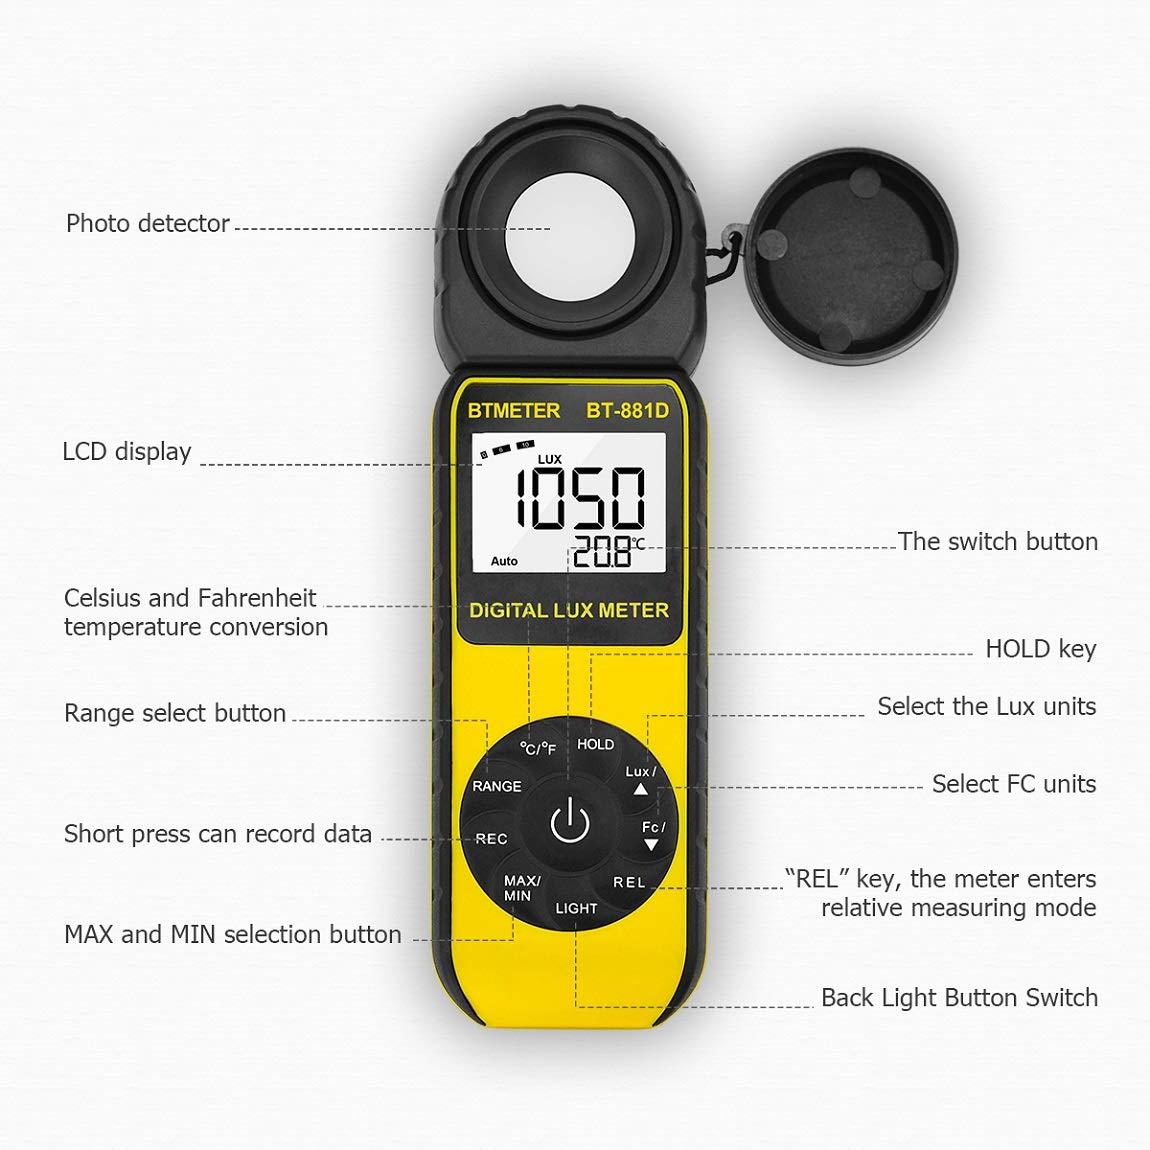 BTMETER BT-881D Digital Illuminance Light Meter, Measure Lights 0.01~400,000 Lux (0.01~40,000 FC) Foot Candles Luxmeter with 270º Rotated Sensor for Plants LED Lights Indoor Outdoor Light Tester by BTMETER (Image #4)